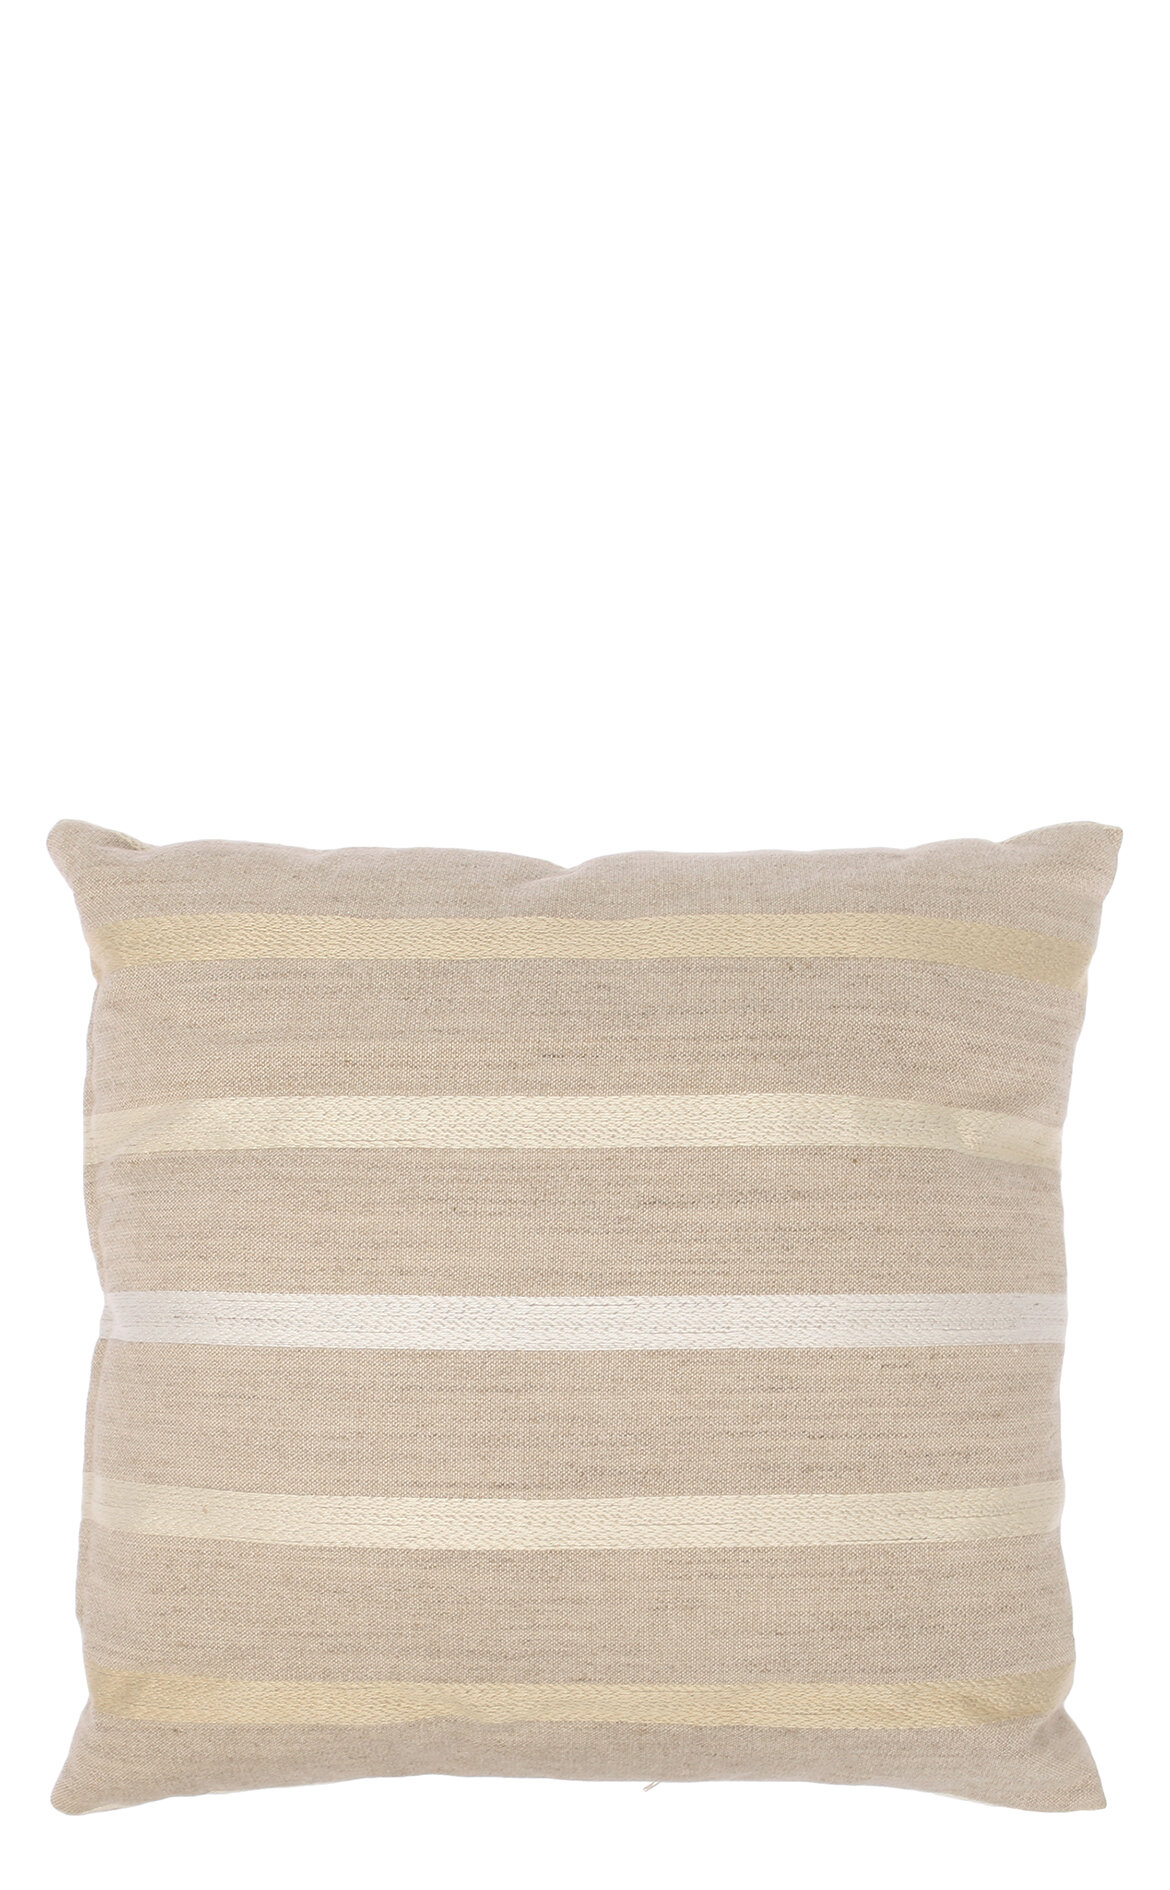 Laura Ashley-Laura Ashley Wvn Stripe Luxford Off White 35X35 cm Dekoratif Yastık